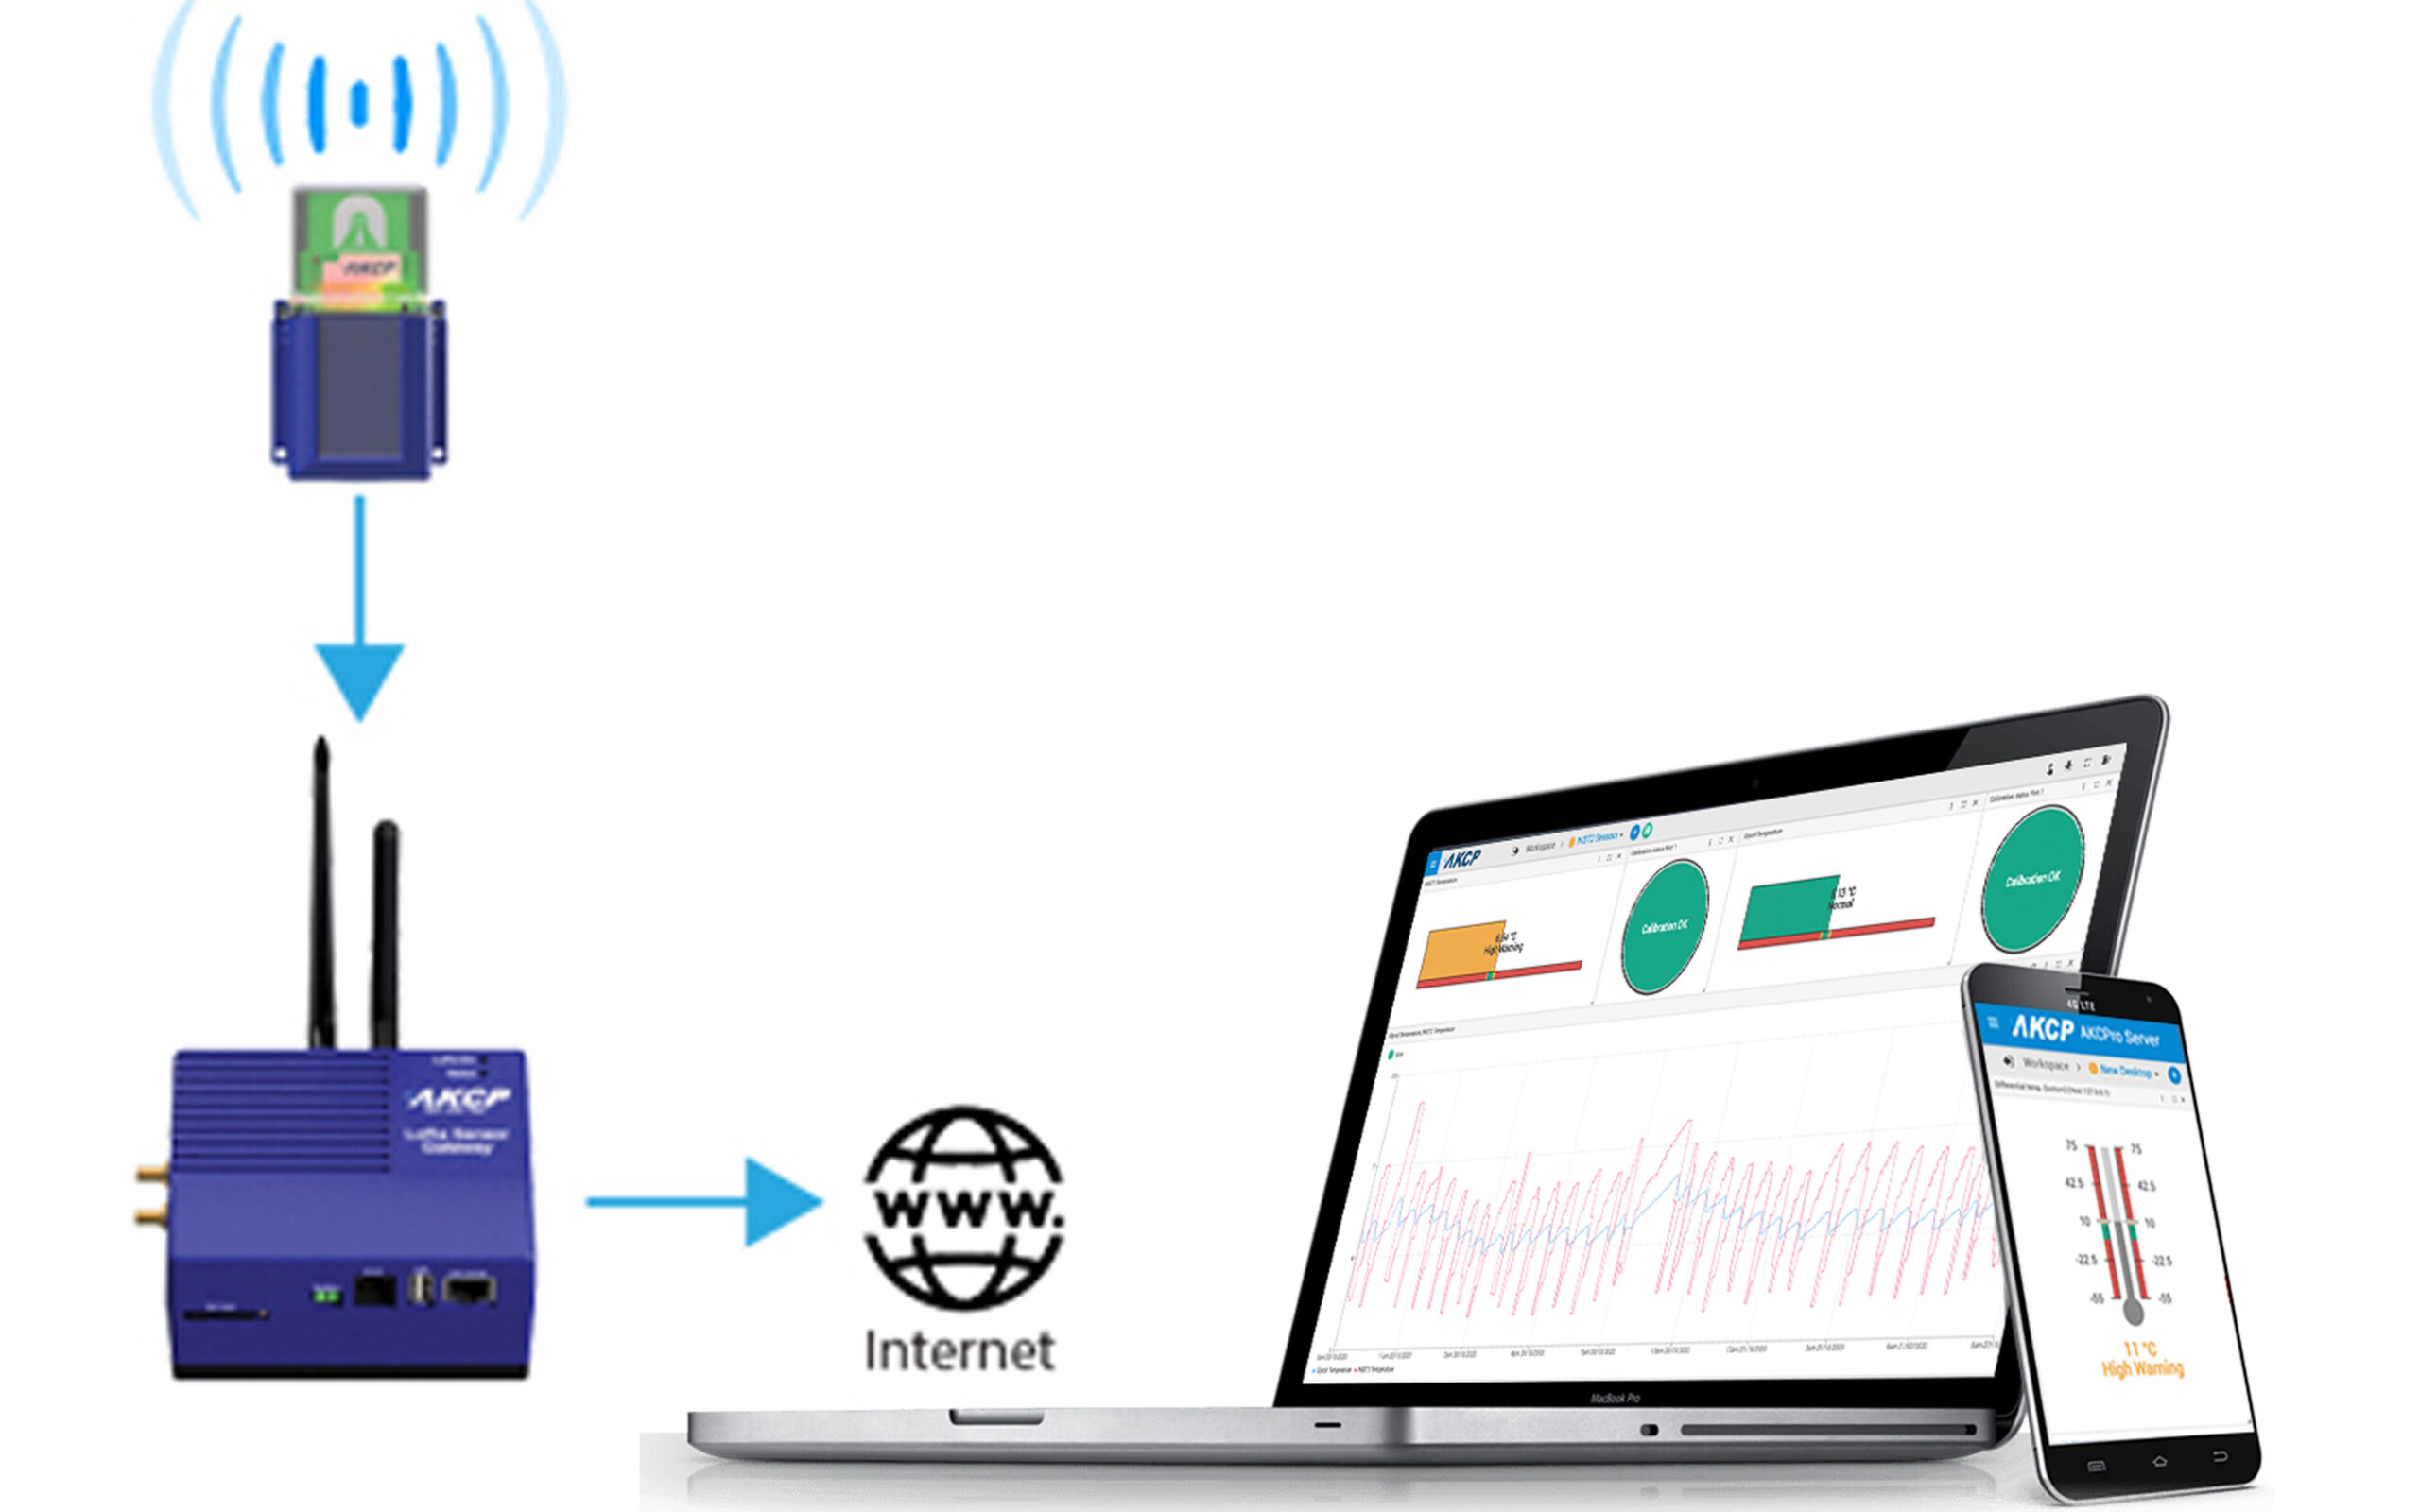 Monitoring Thru data transfer to mobile phone and laptop